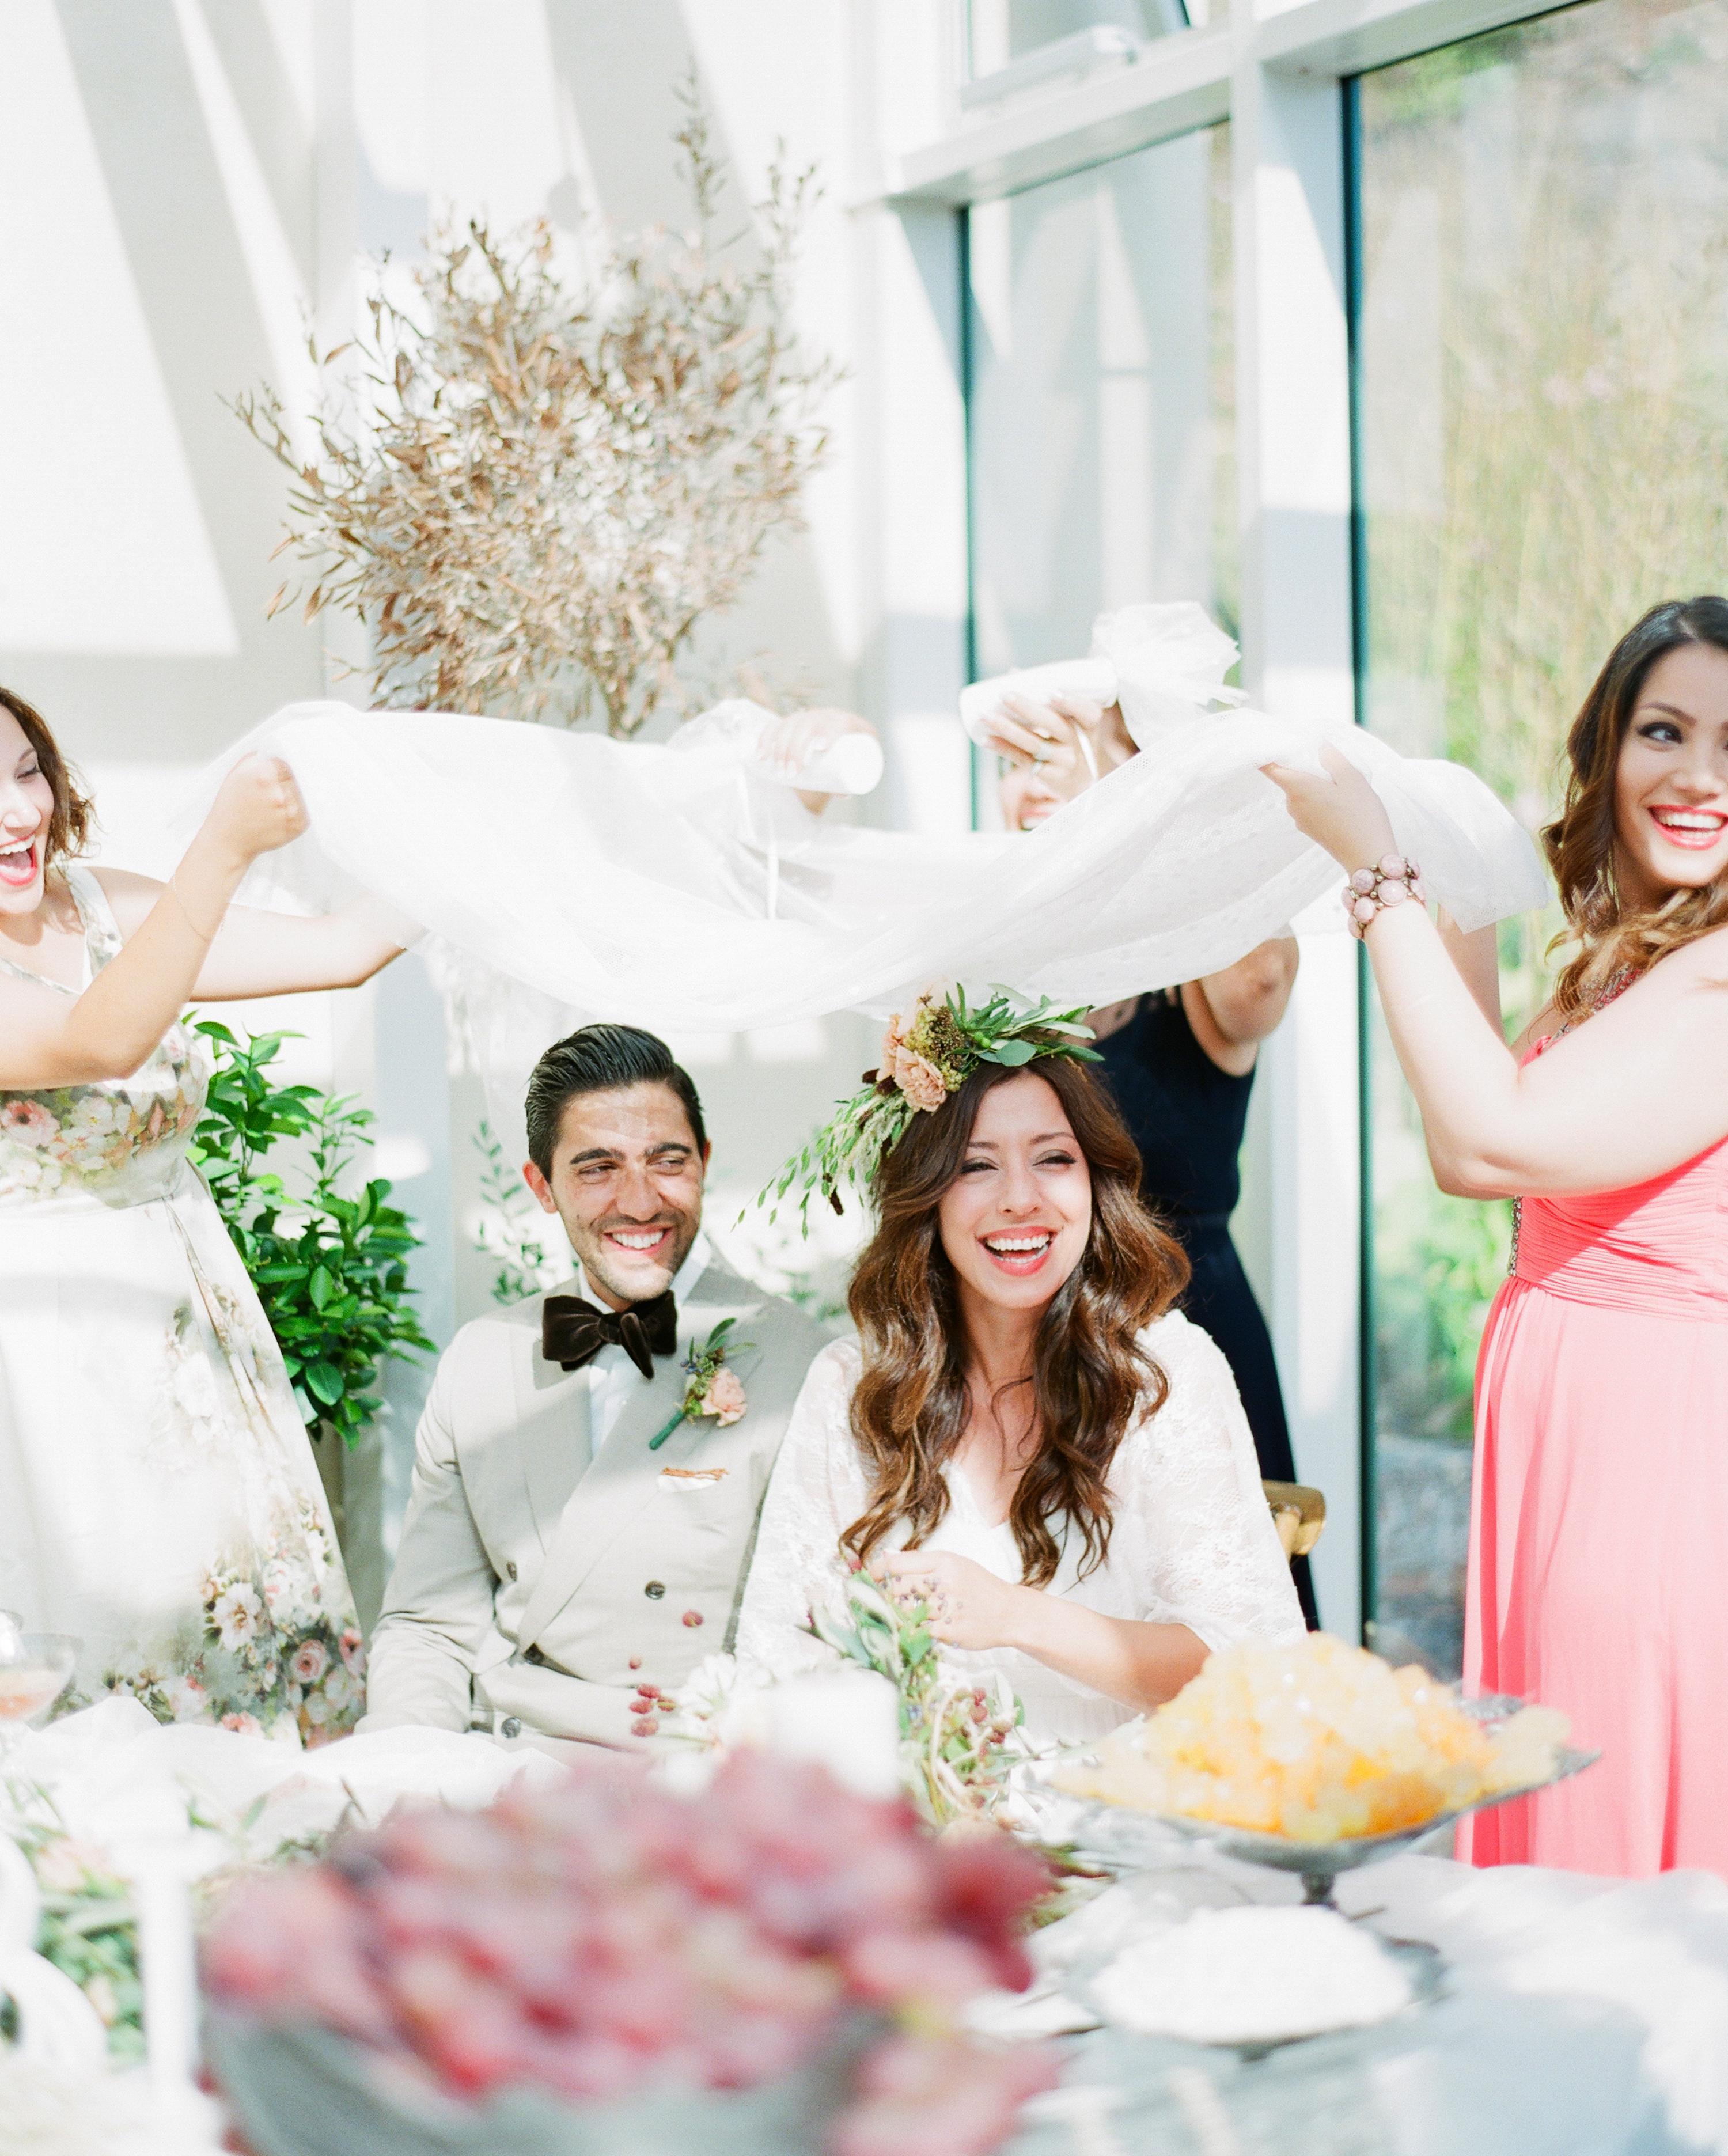 negin-chris-wedding-ceremony-0388-s112116-0815.jpg